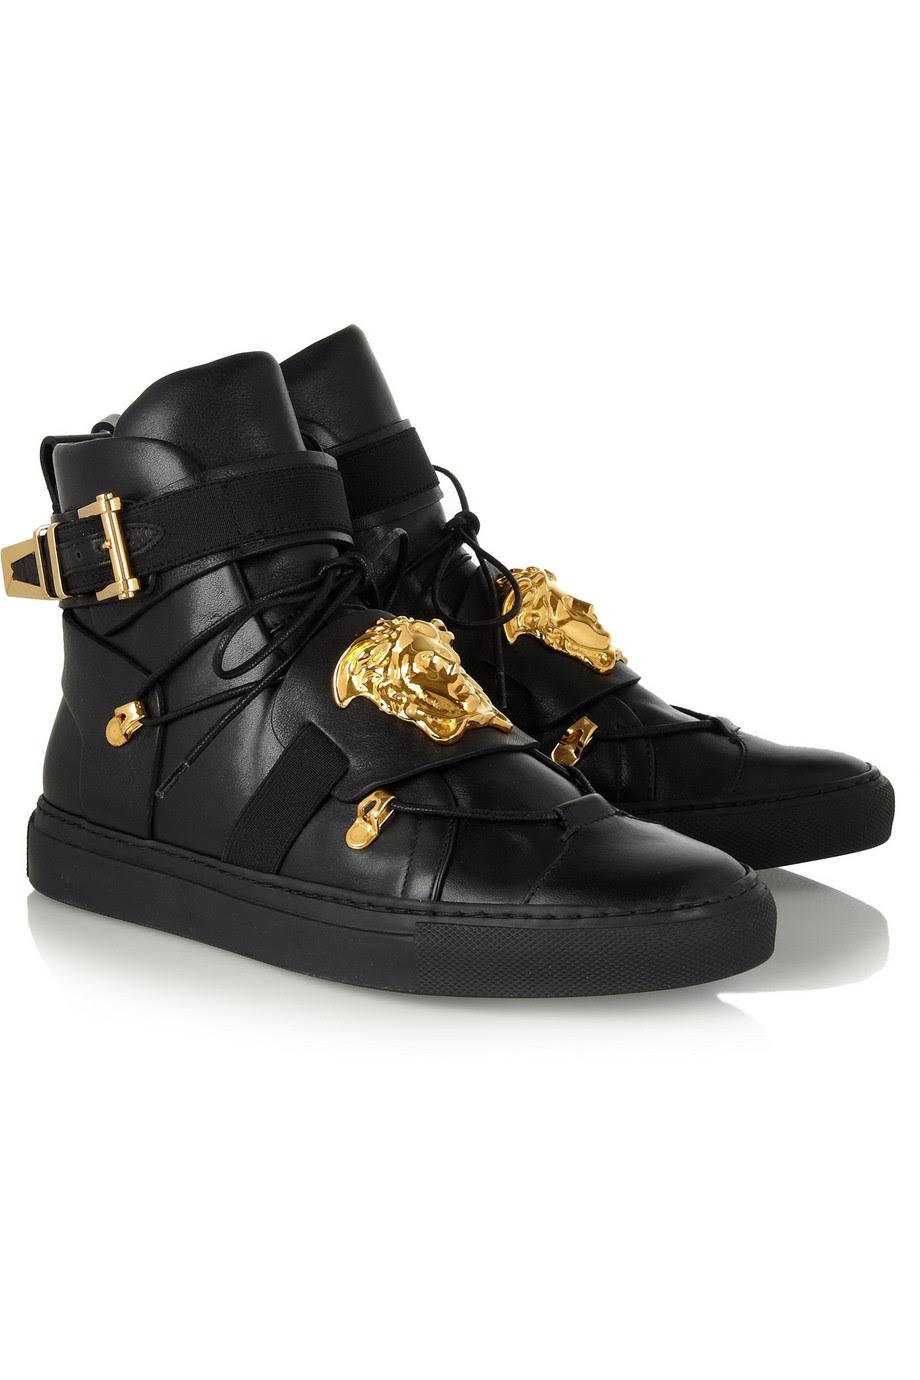 Bm Womens Shoes In Men Size